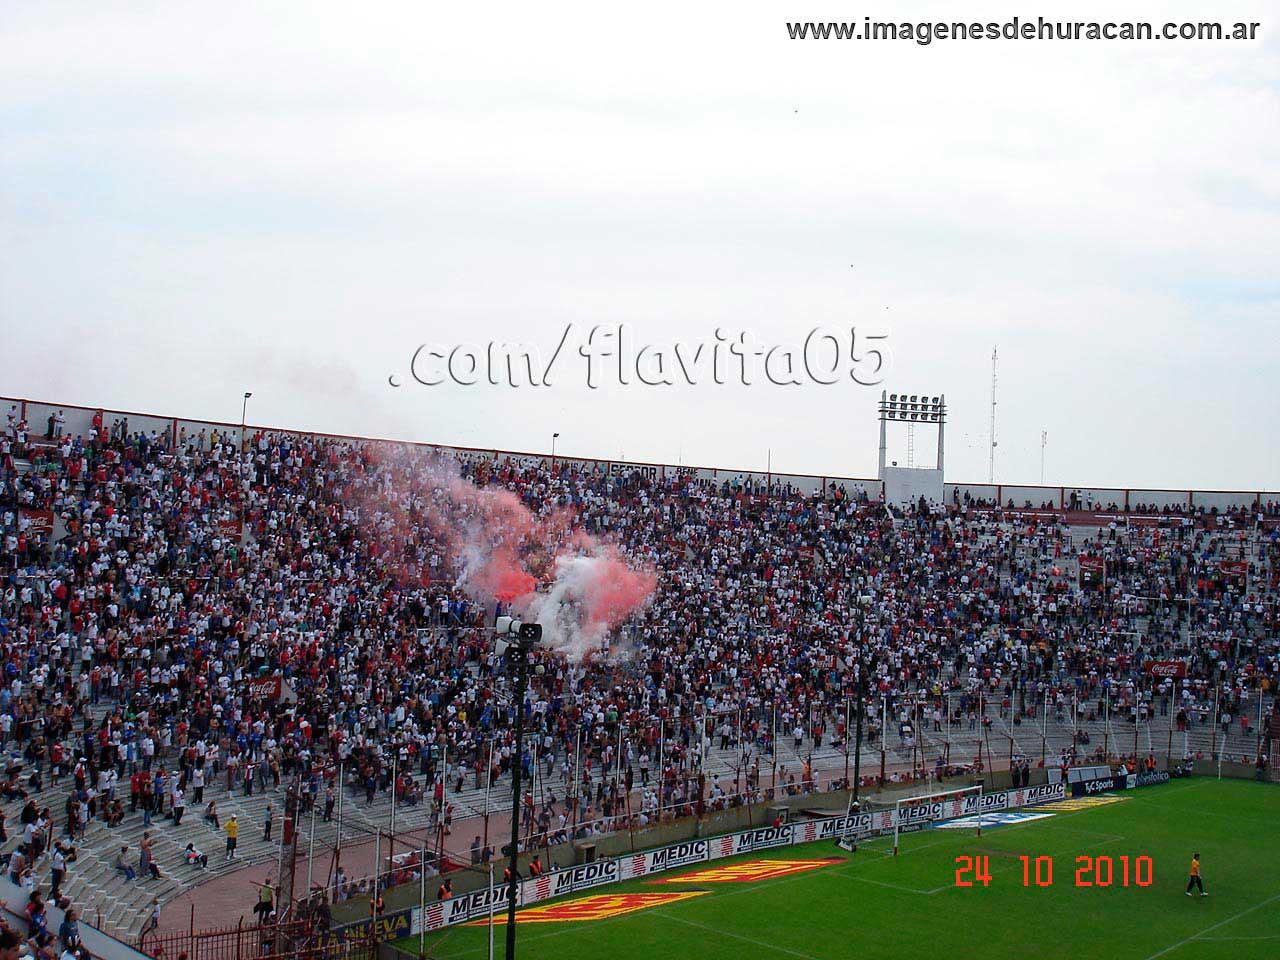 Huracán San Lorenzo - fecha 12 - Apertura 2010